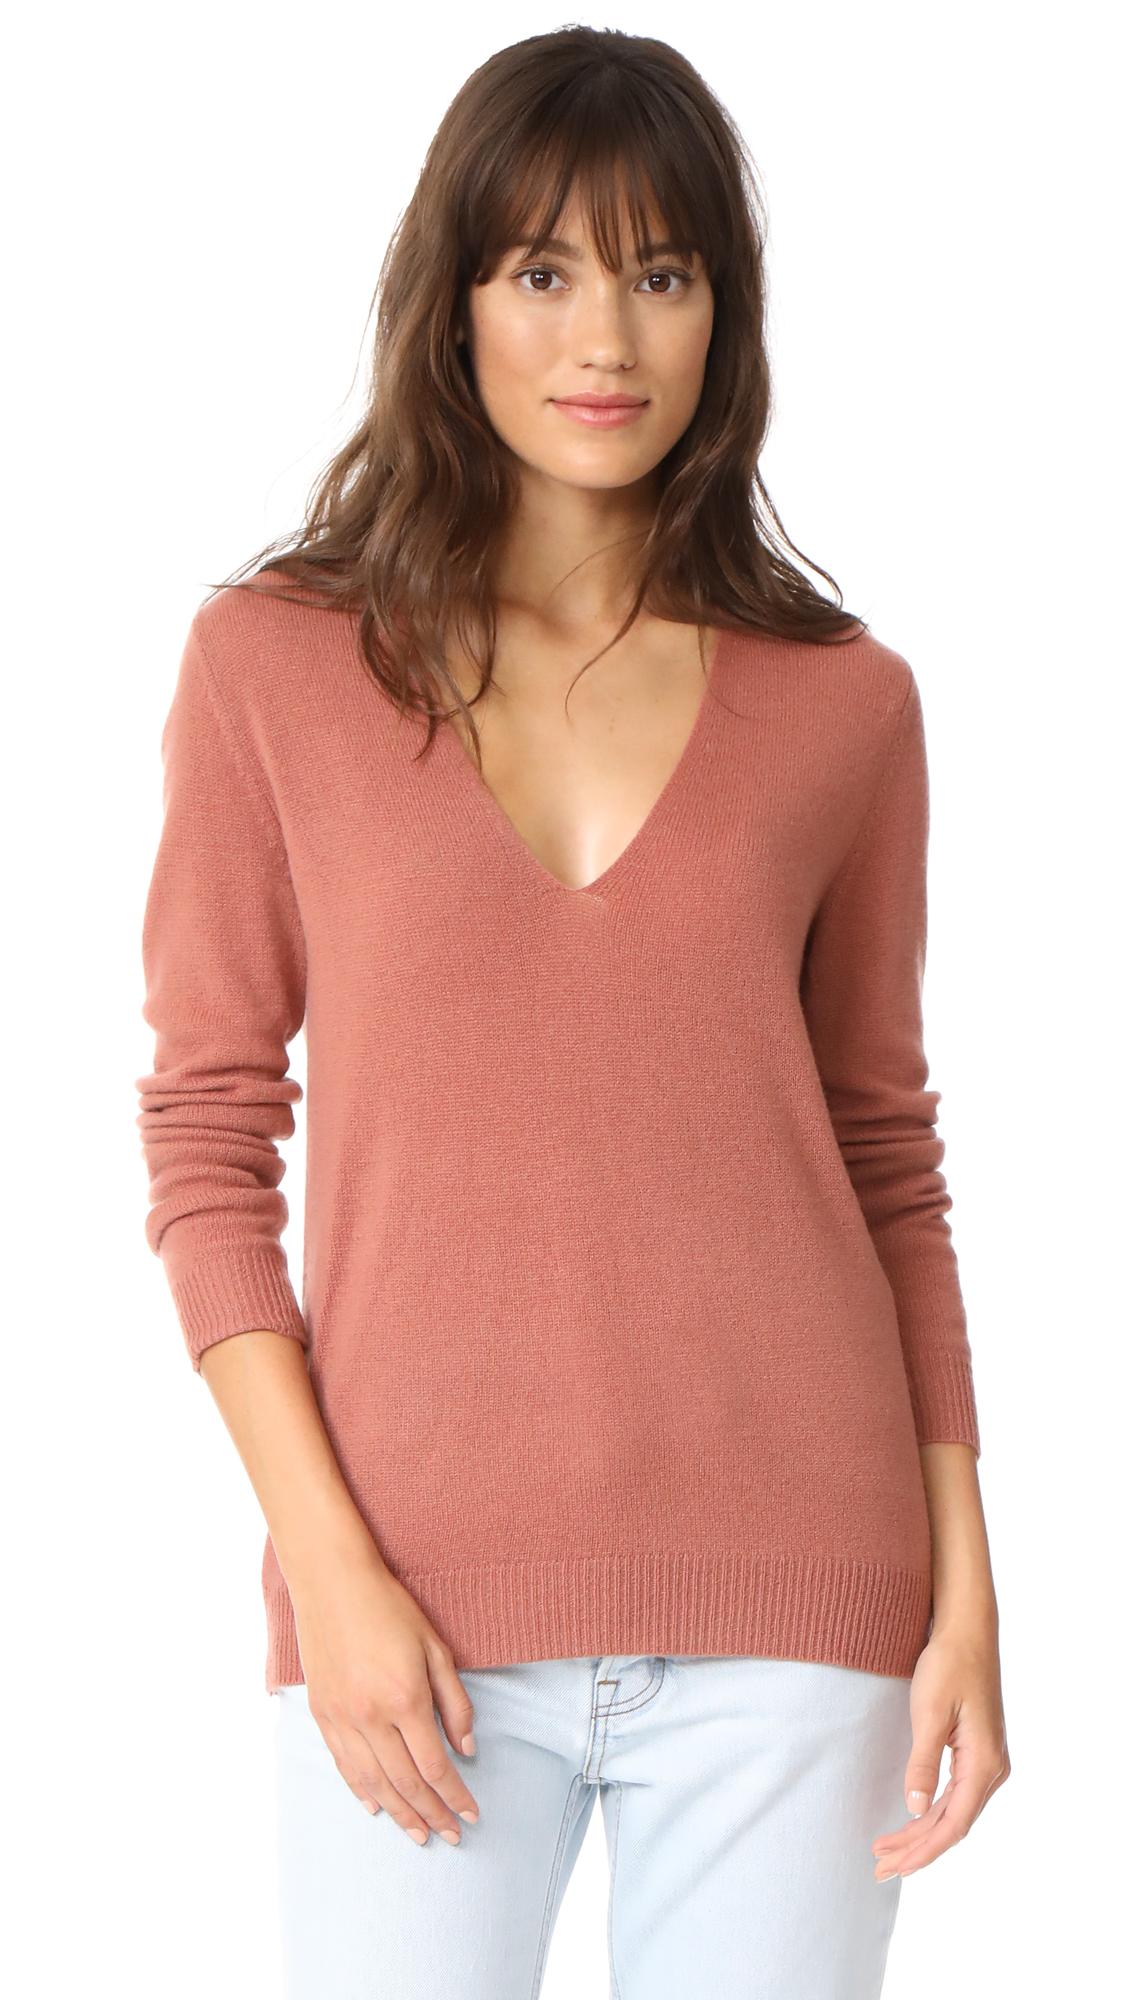 Theory Adrianna Cashmere Sweater - Deep Rose